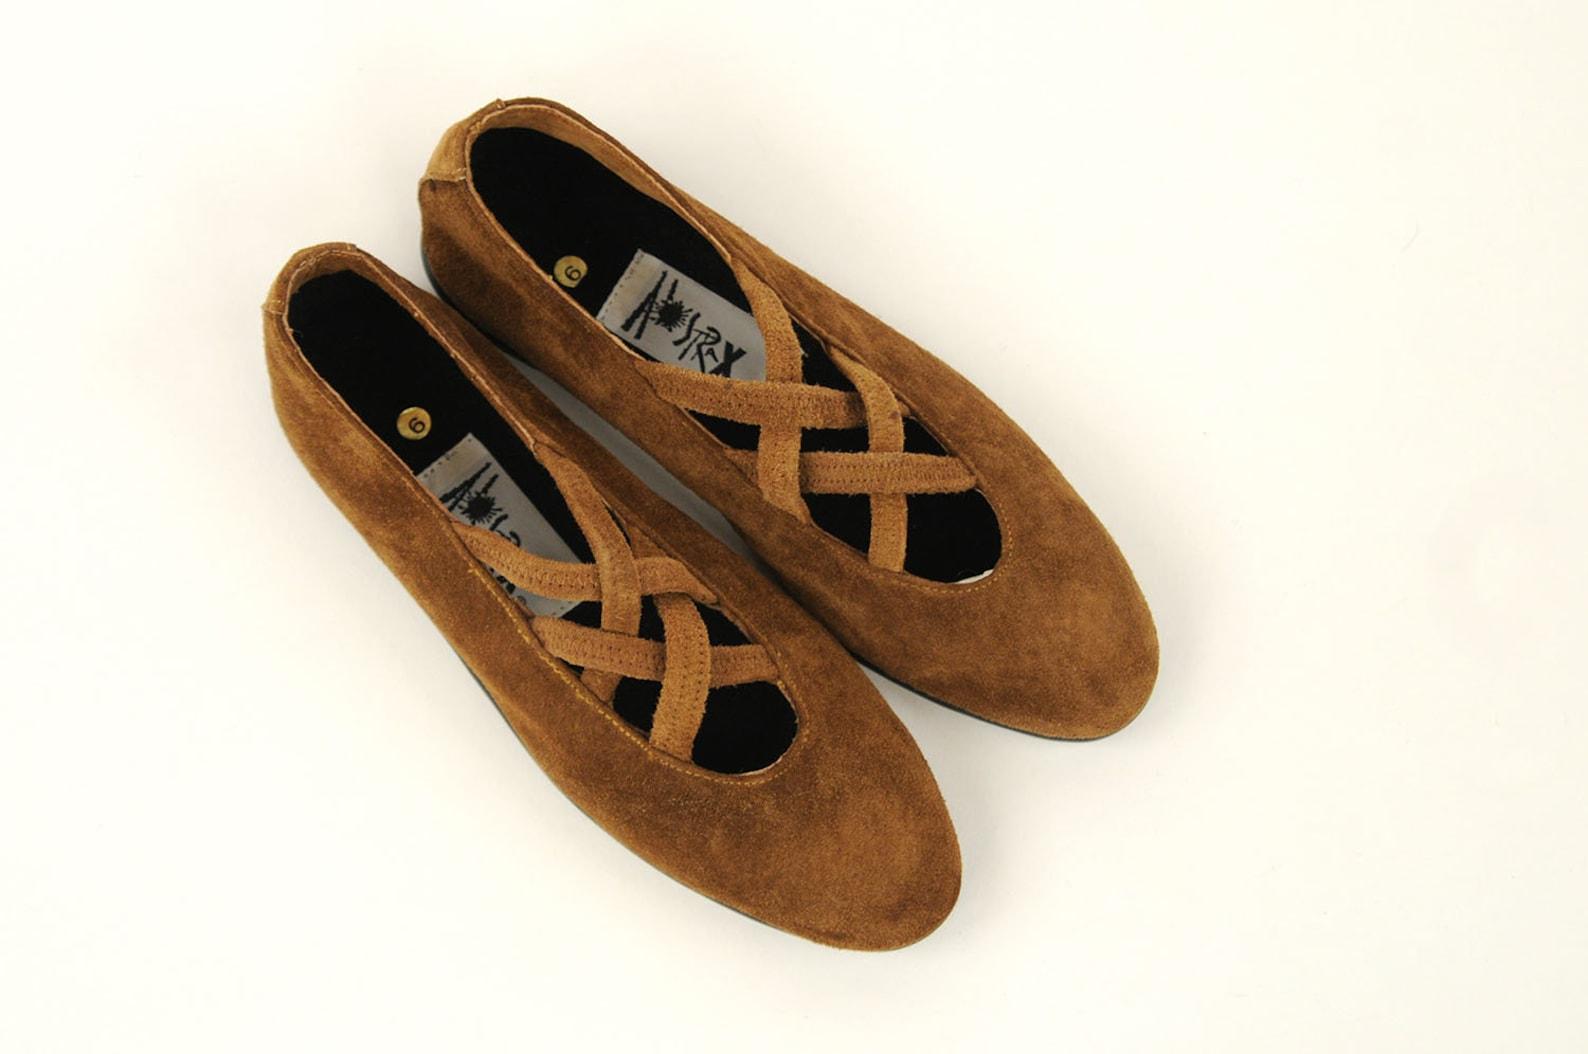 vintage 80s brown leather suede ballet shoes criss cross slip on flats preppy nos 6